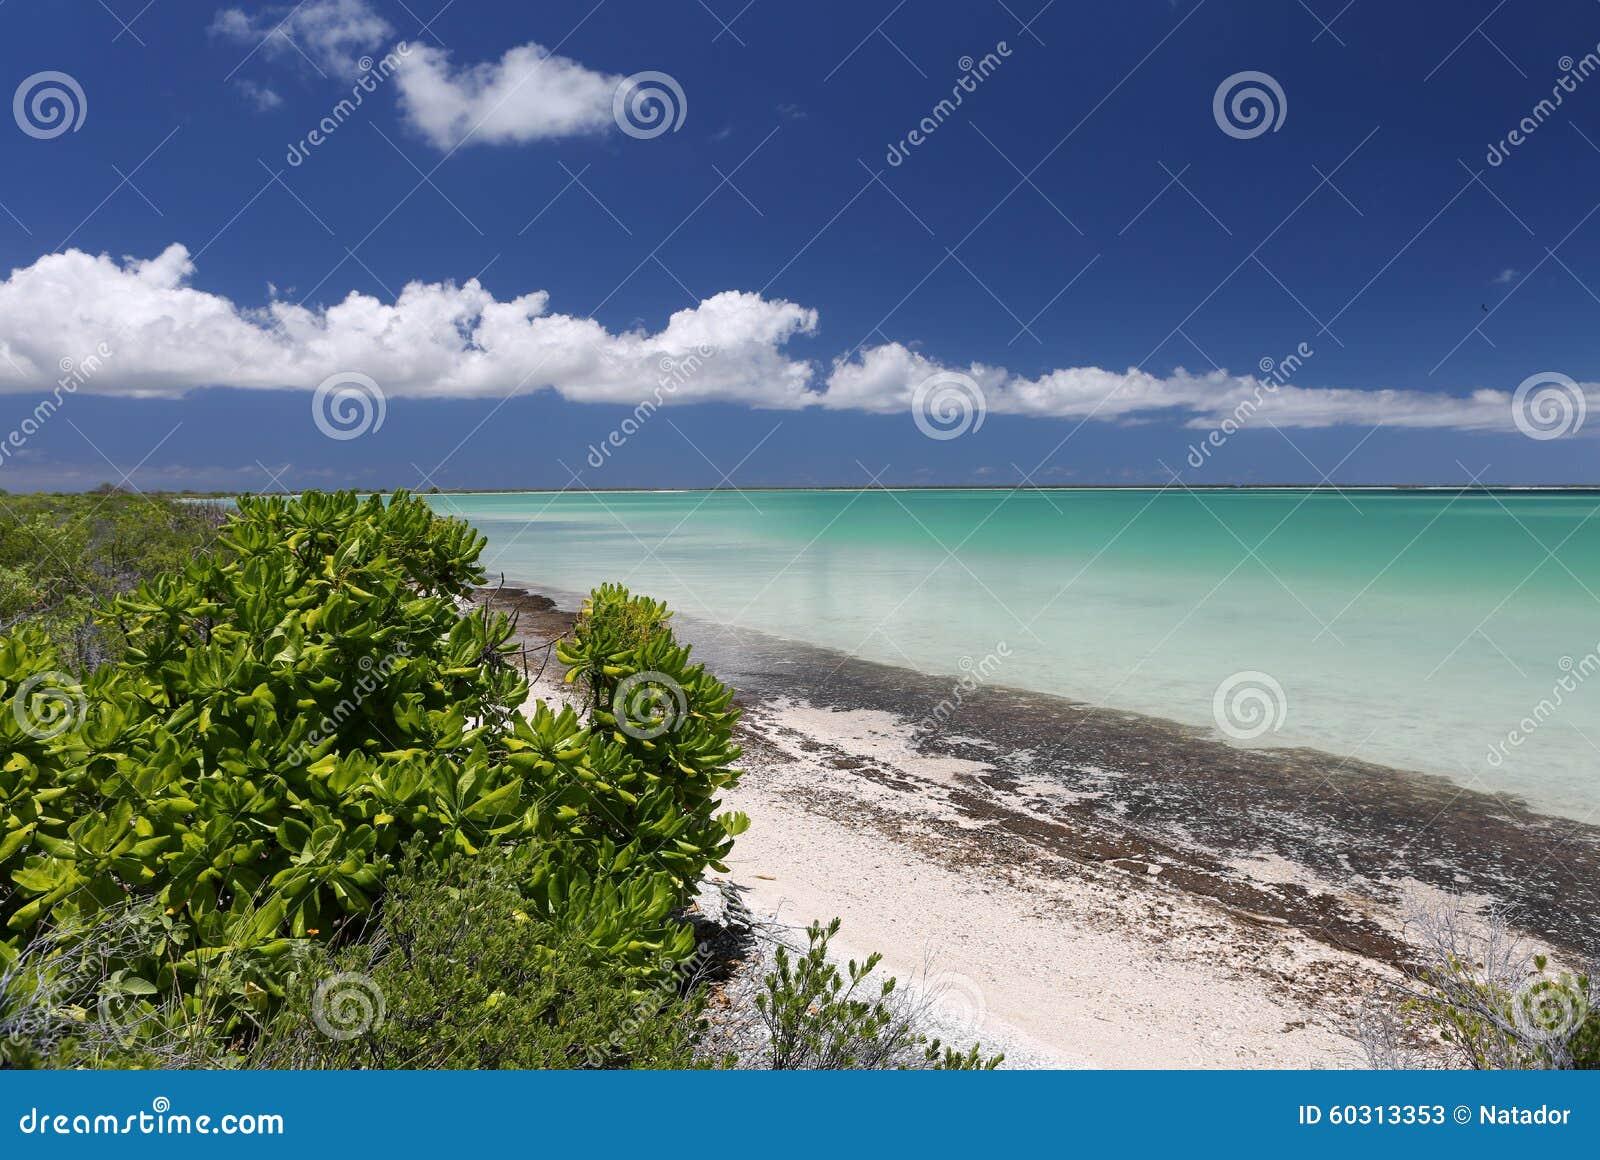 Lagoon Tropical Island: Tropical Island In Turquoise Water Lagoon Stock Image